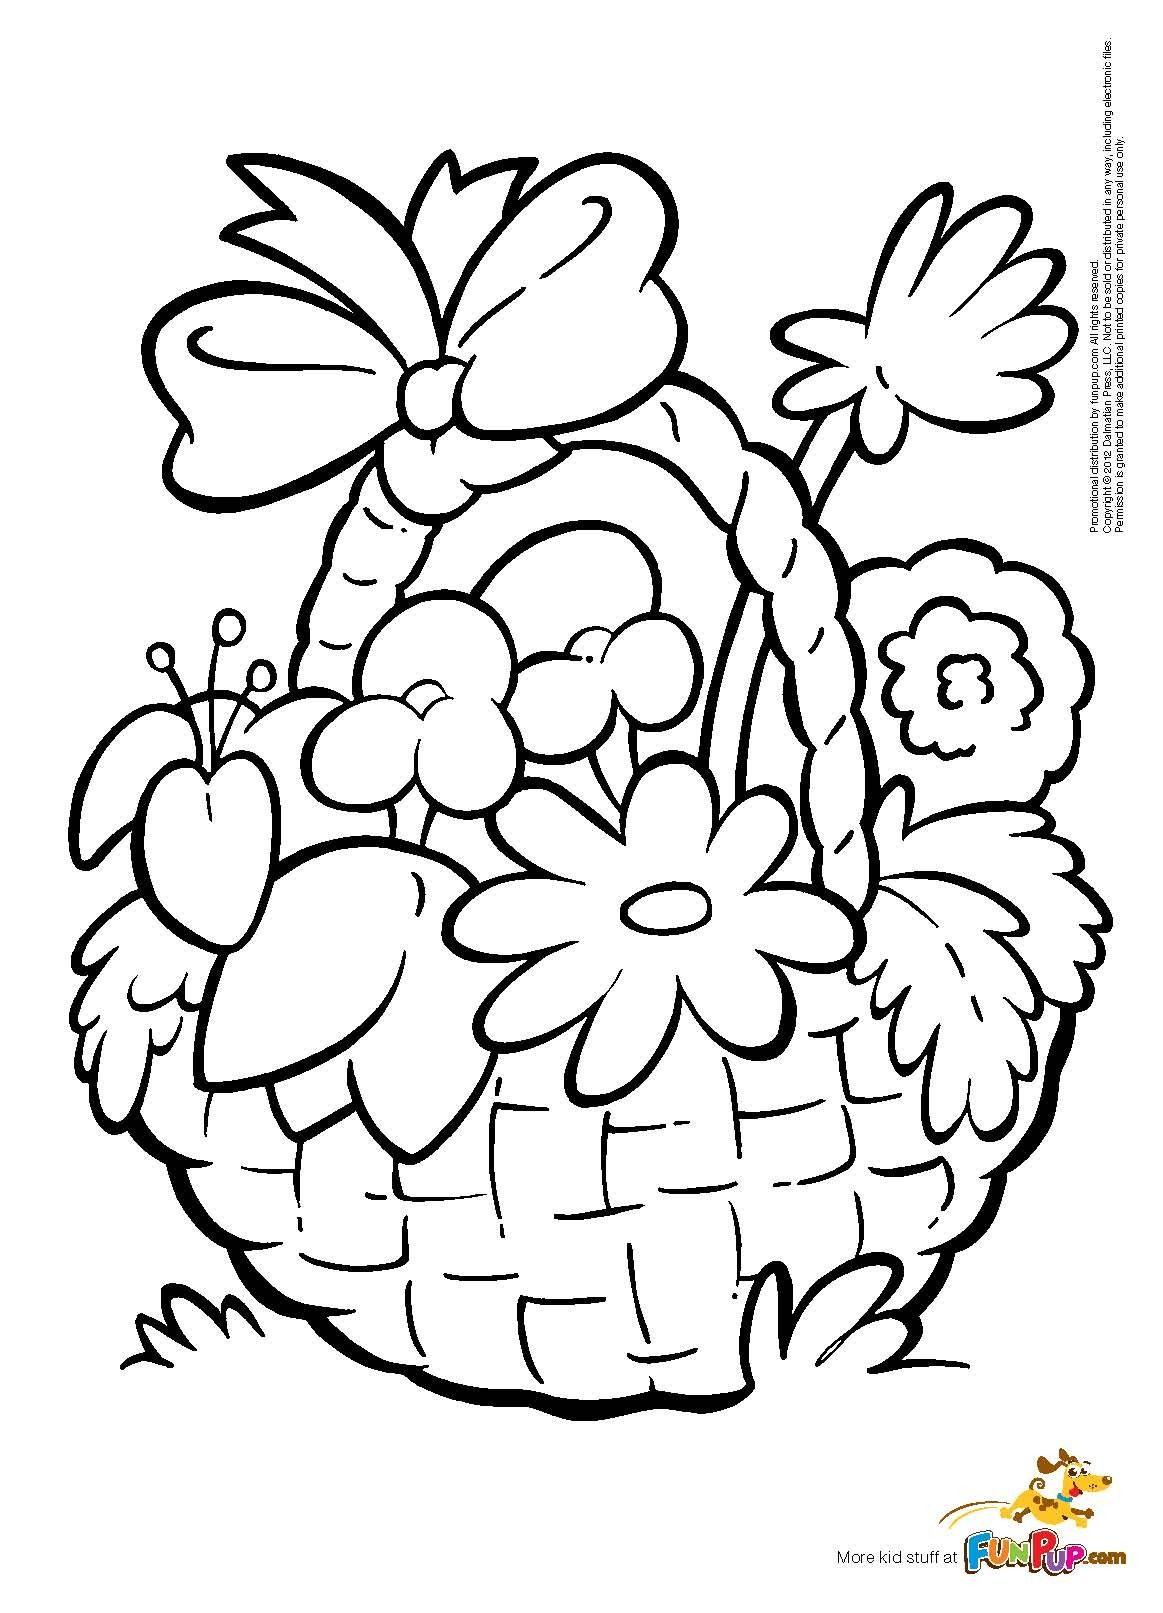 Flower Basket Coloring Page Free printable coloring